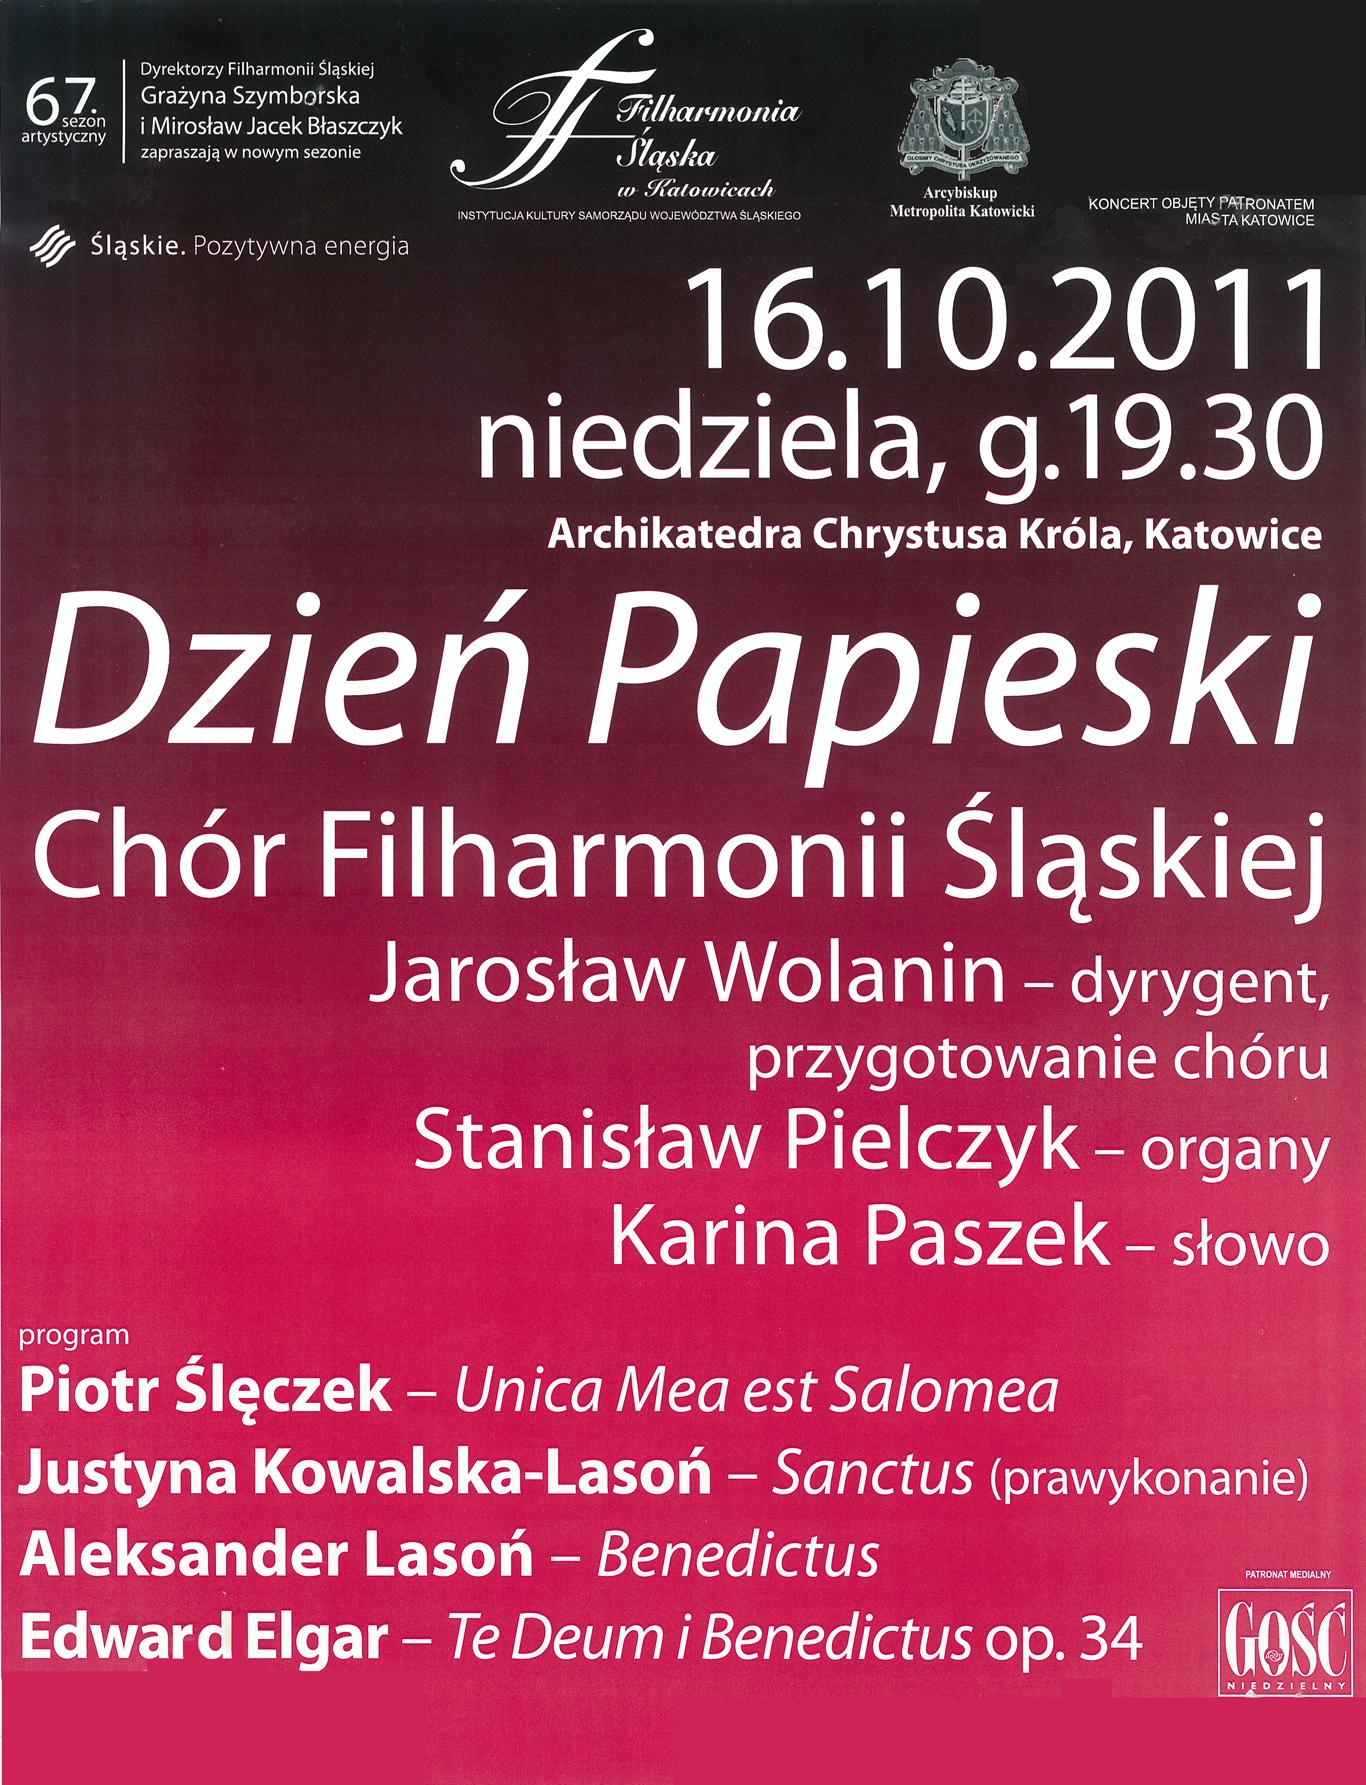 Dzien Papieski.16.10.11_maly.jpg